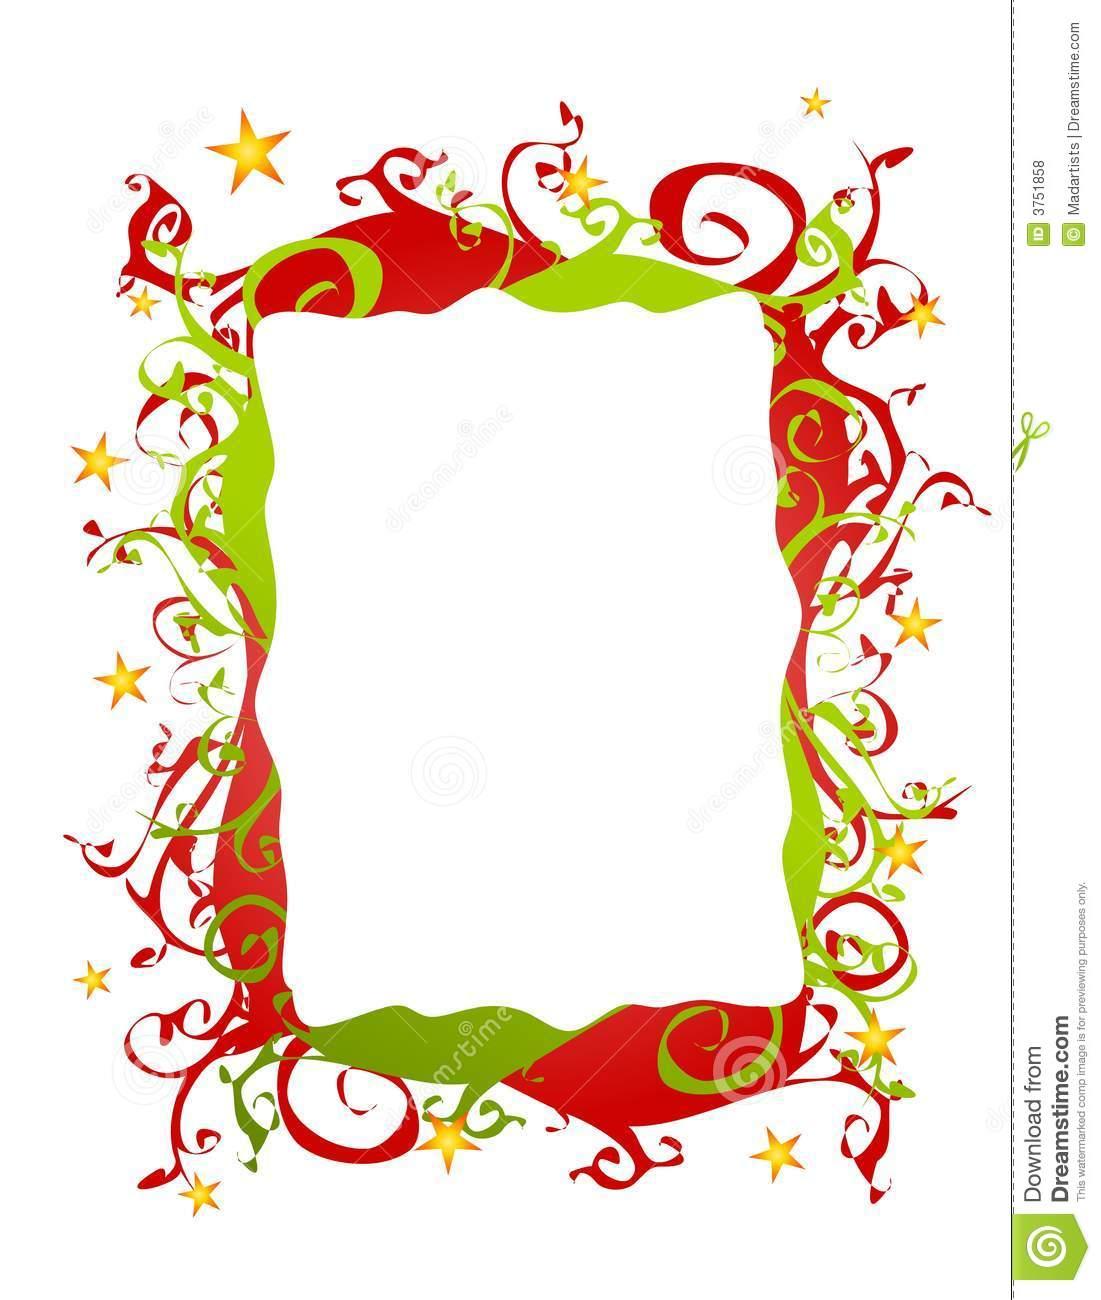 christmas borders clip art .-christmas borders clip art .-17